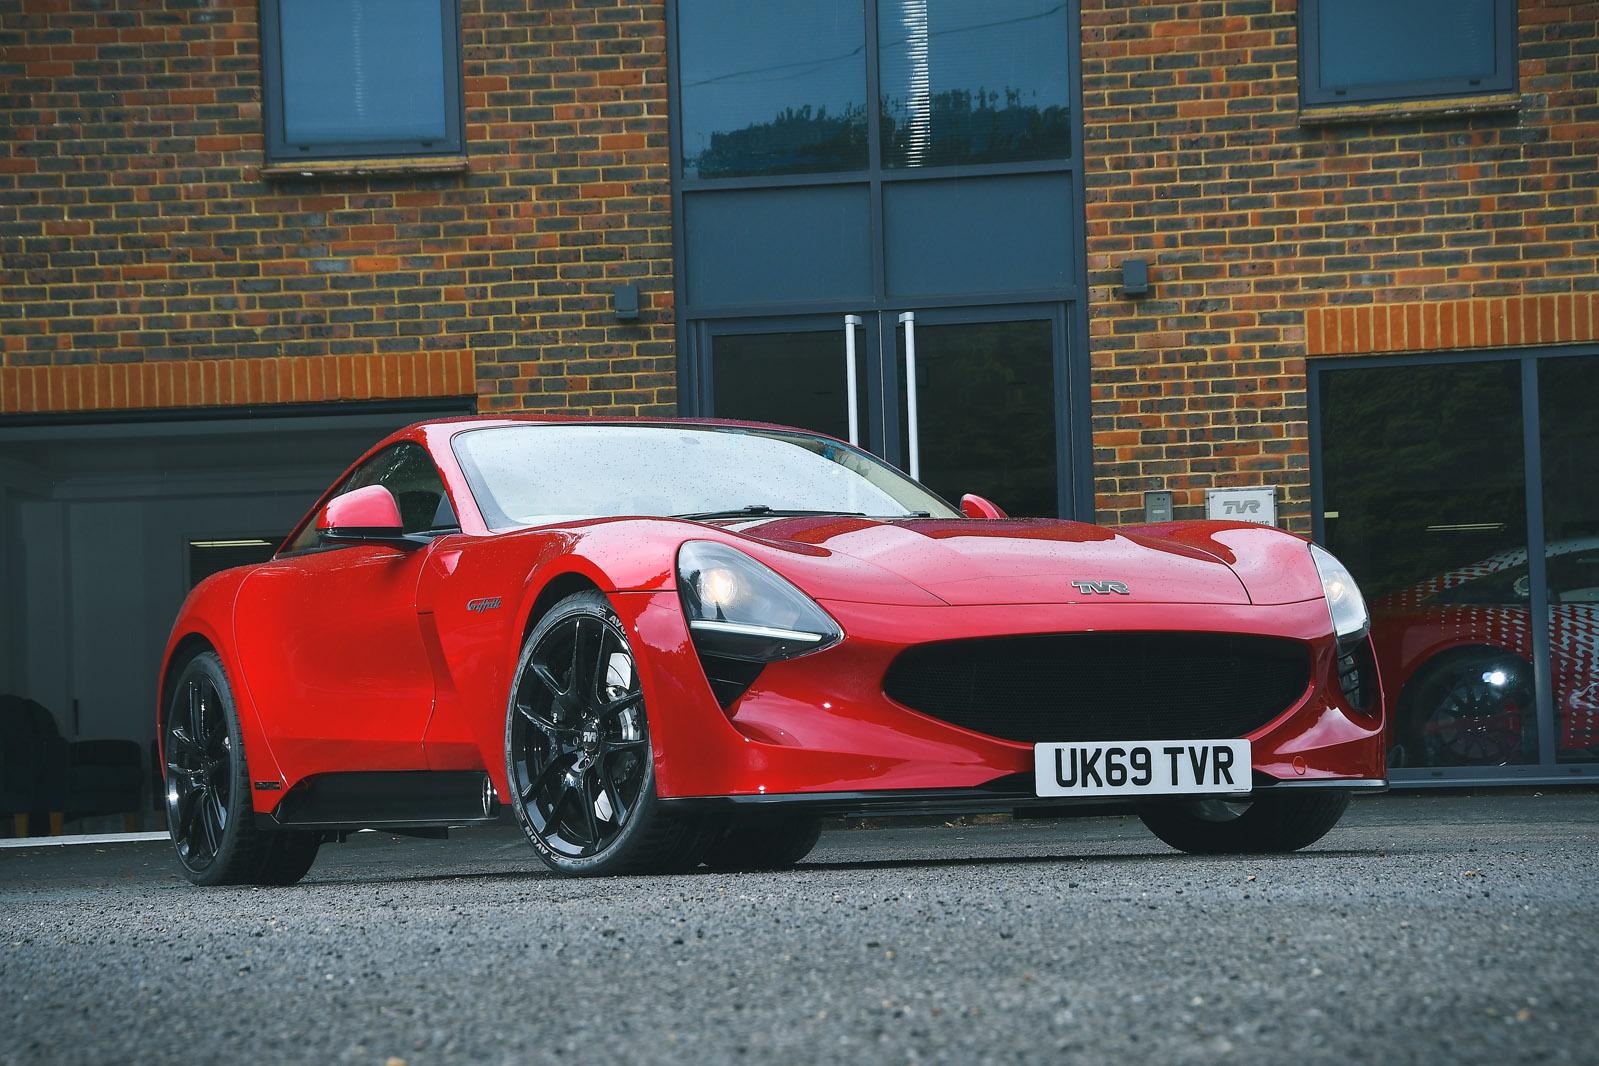 www.autocar.co.uk